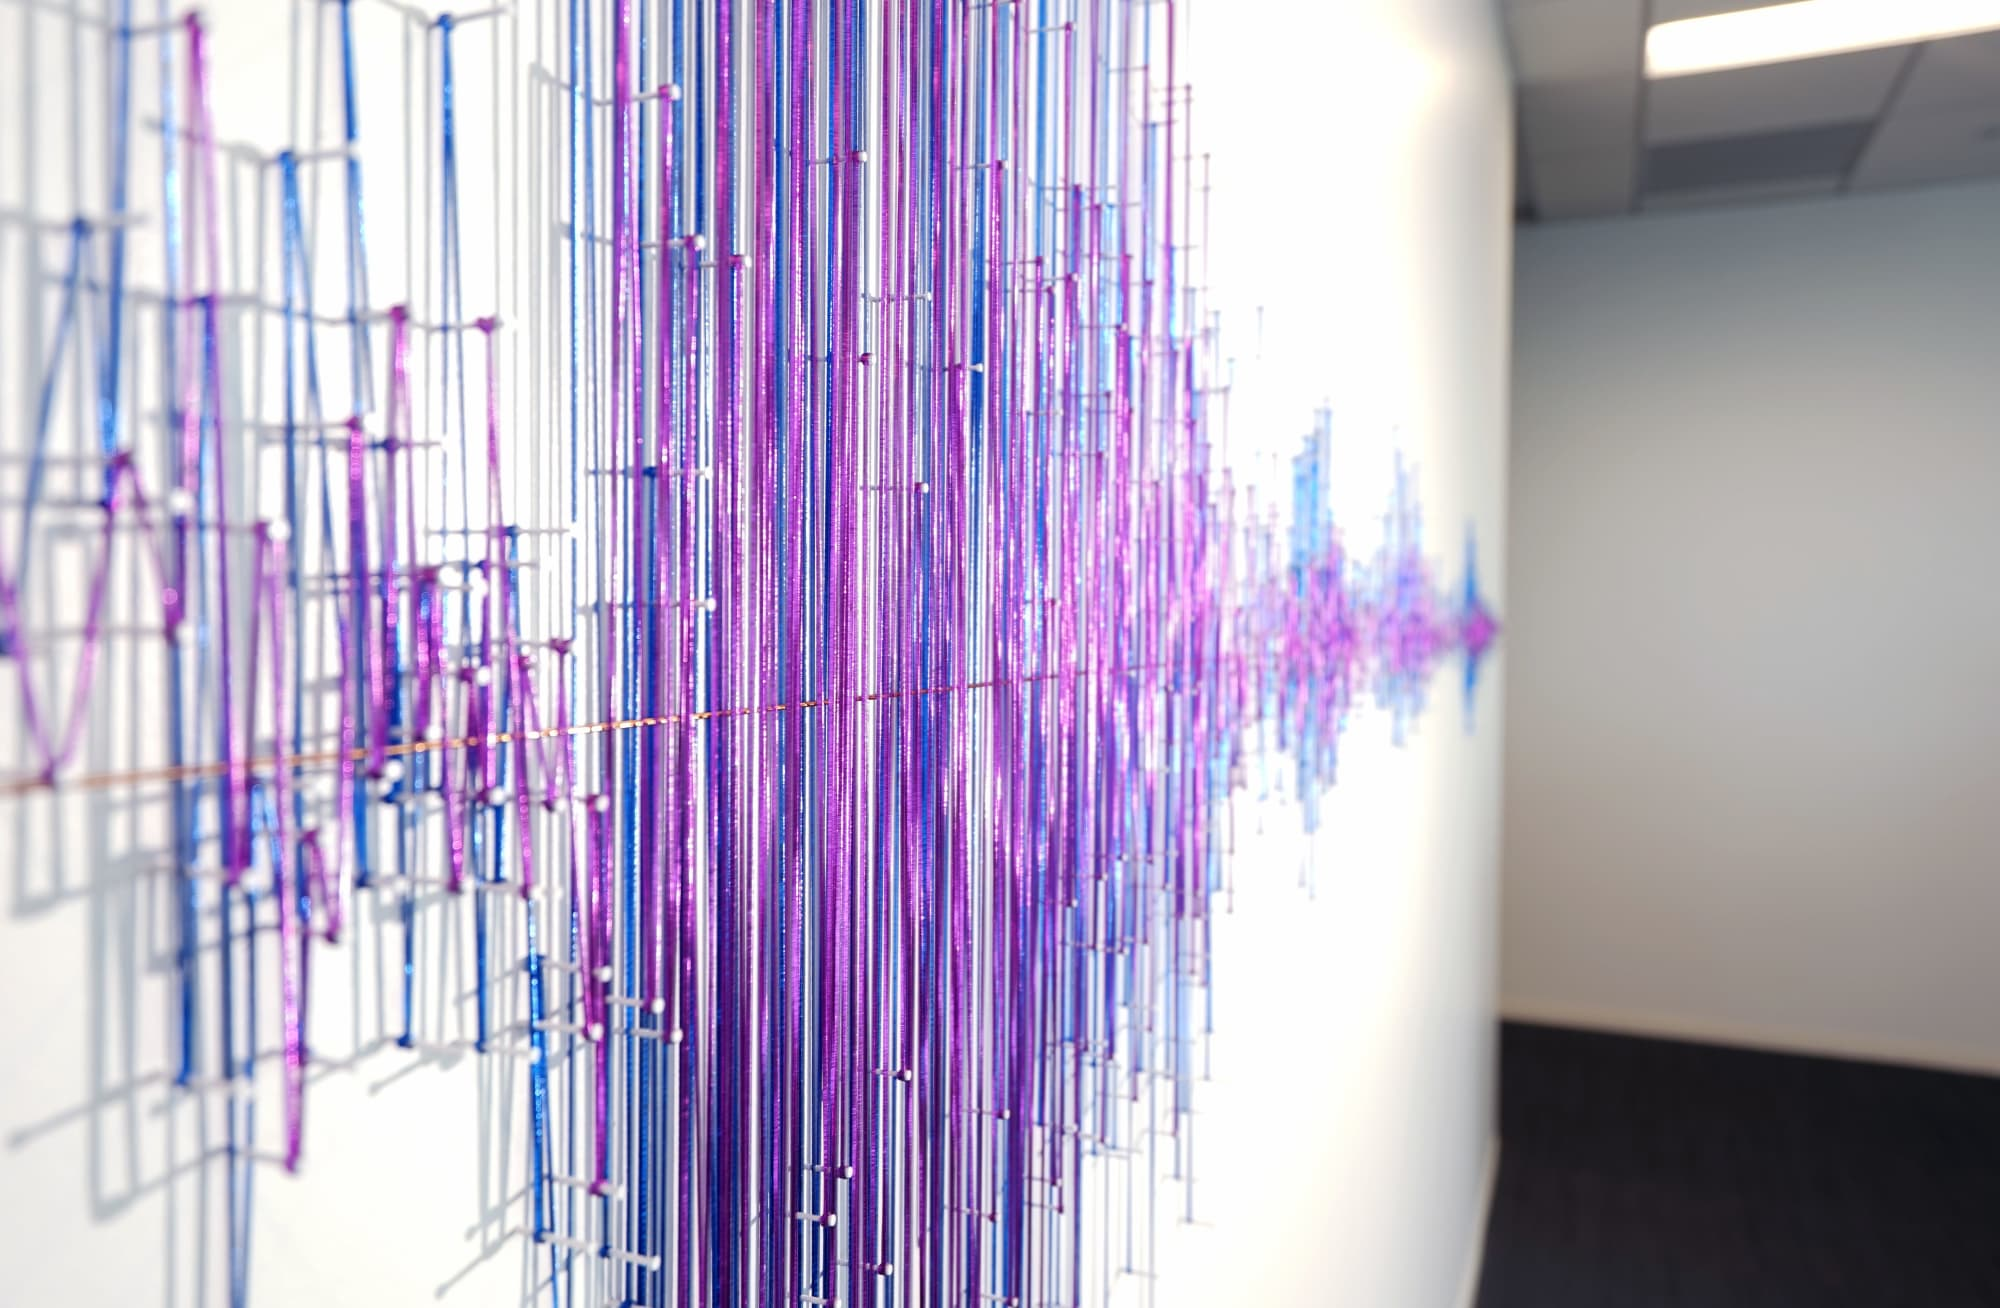 Art & Wall Decor by ANTLRE - Hannah Sitzer seen at 151 S Almaden Blvd, San Jose - Soundwave sculpture for Adobe Premiere